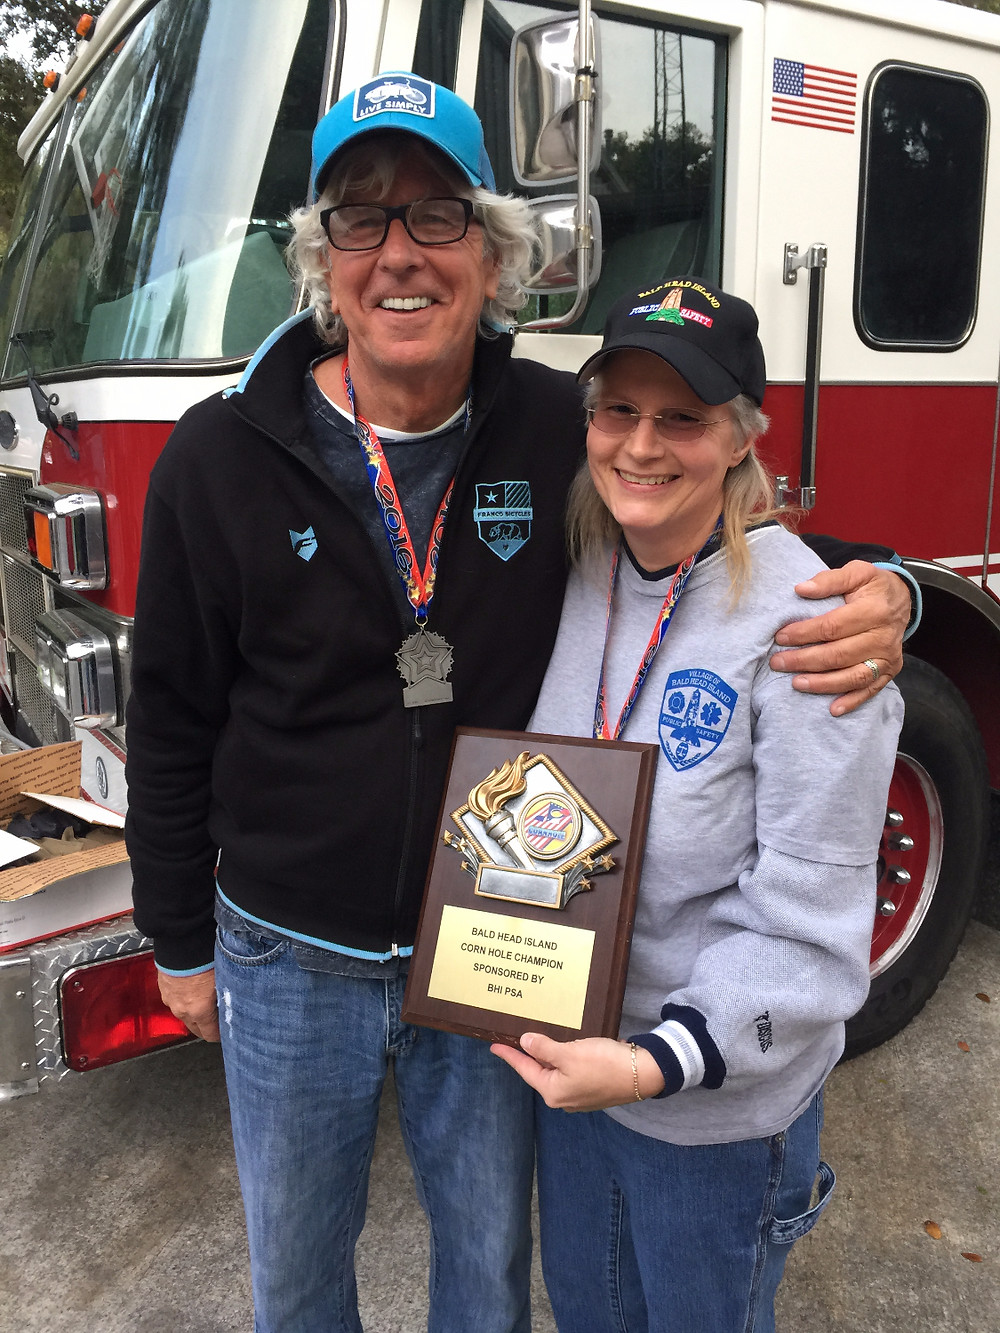 John and Tonya 2016 Cornhole Champions